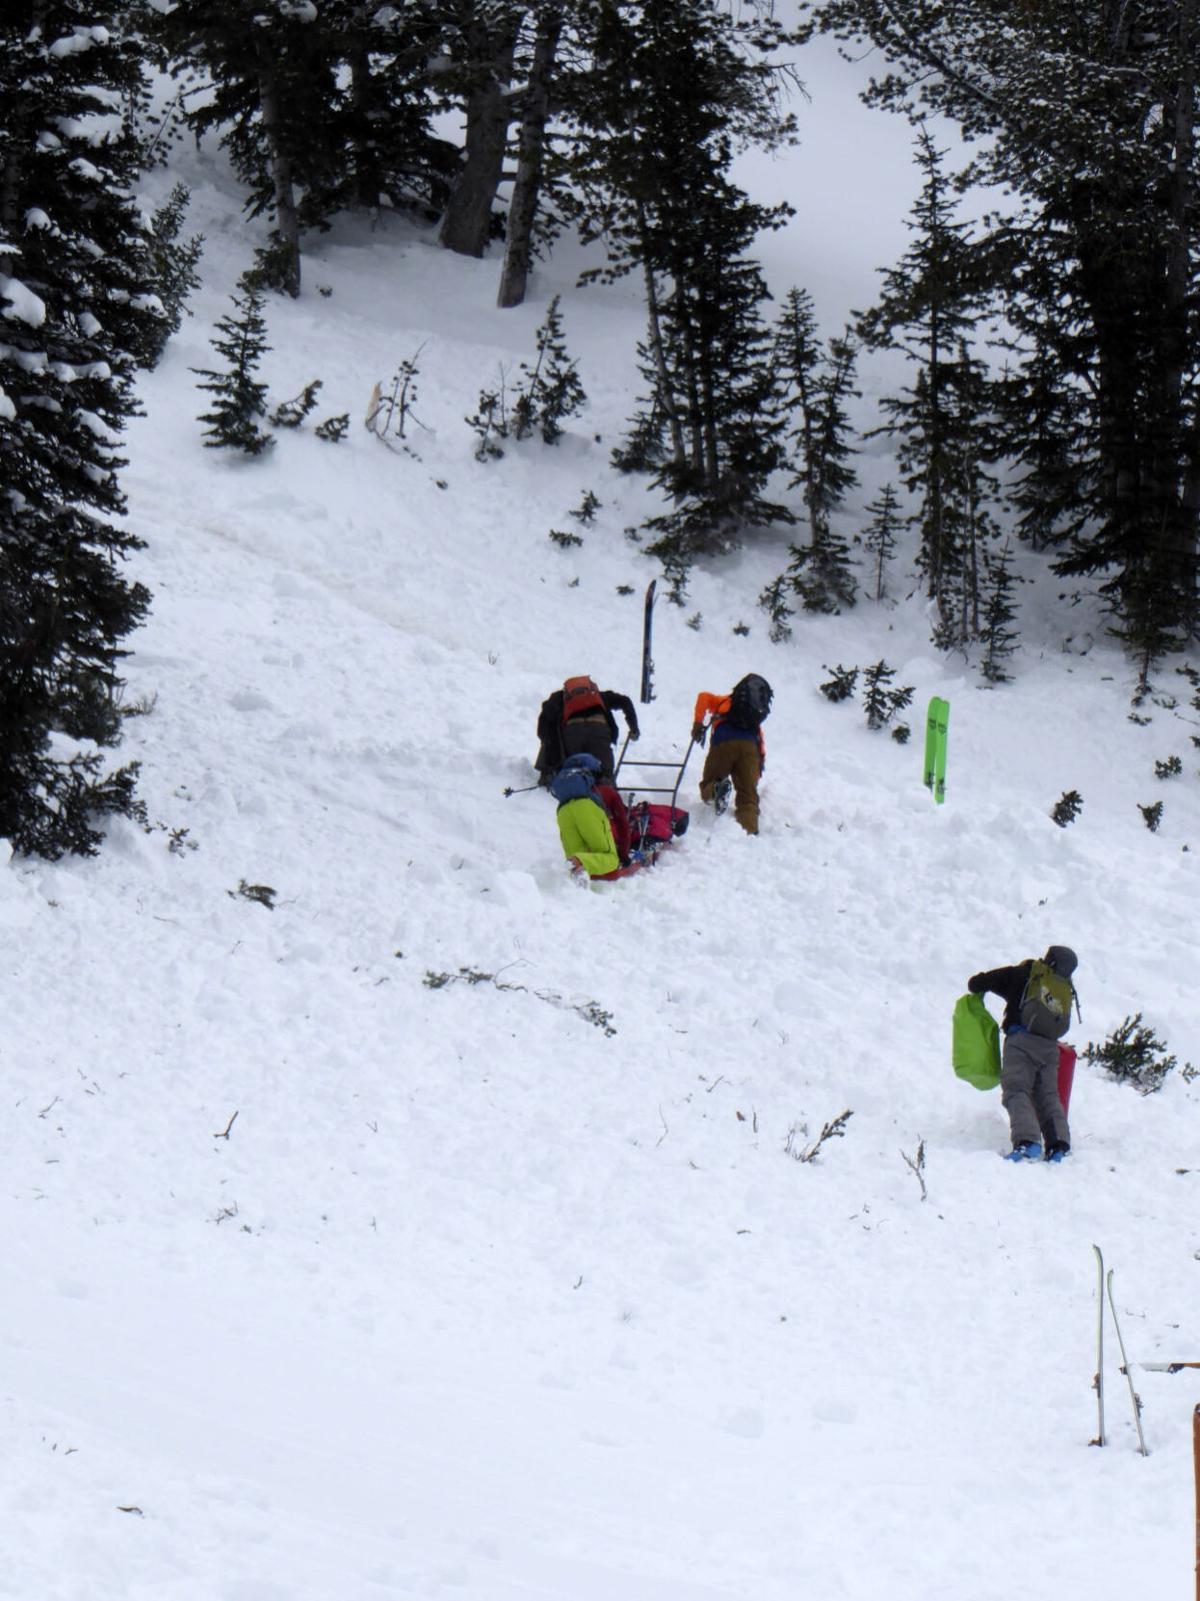 Rockies-Avalanche Danger